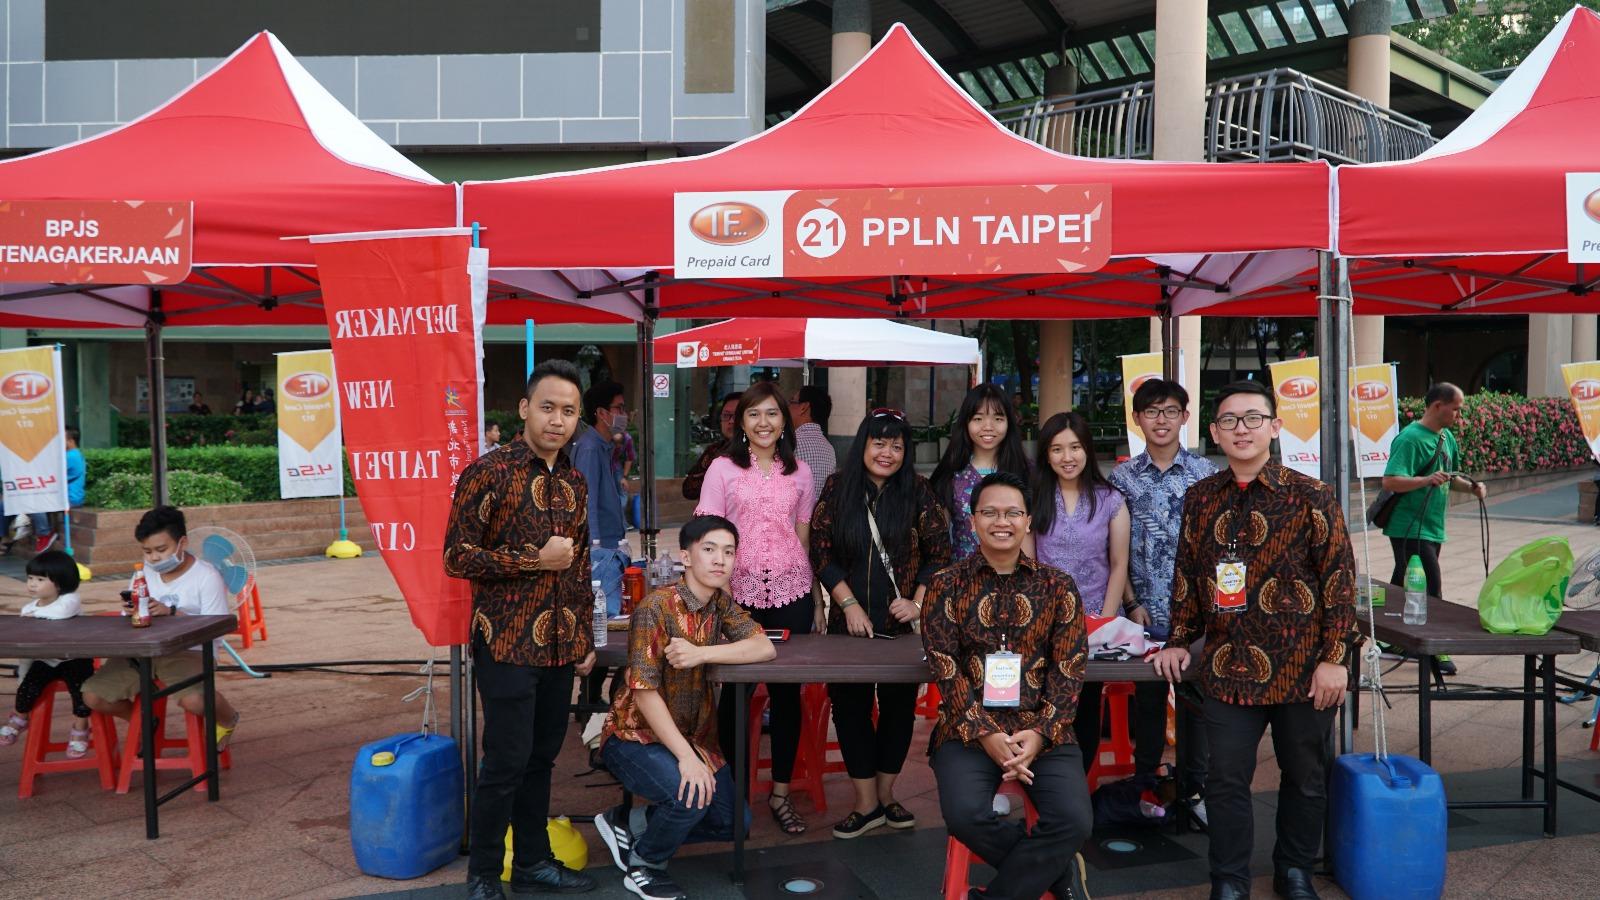 Tak lupa PPLN Taipei melakukan foto bersama di depan booth milik mereka demi melayani WNI yang ingin mendaftar sebagai DPTLN Taiwan © PPLN Taipei